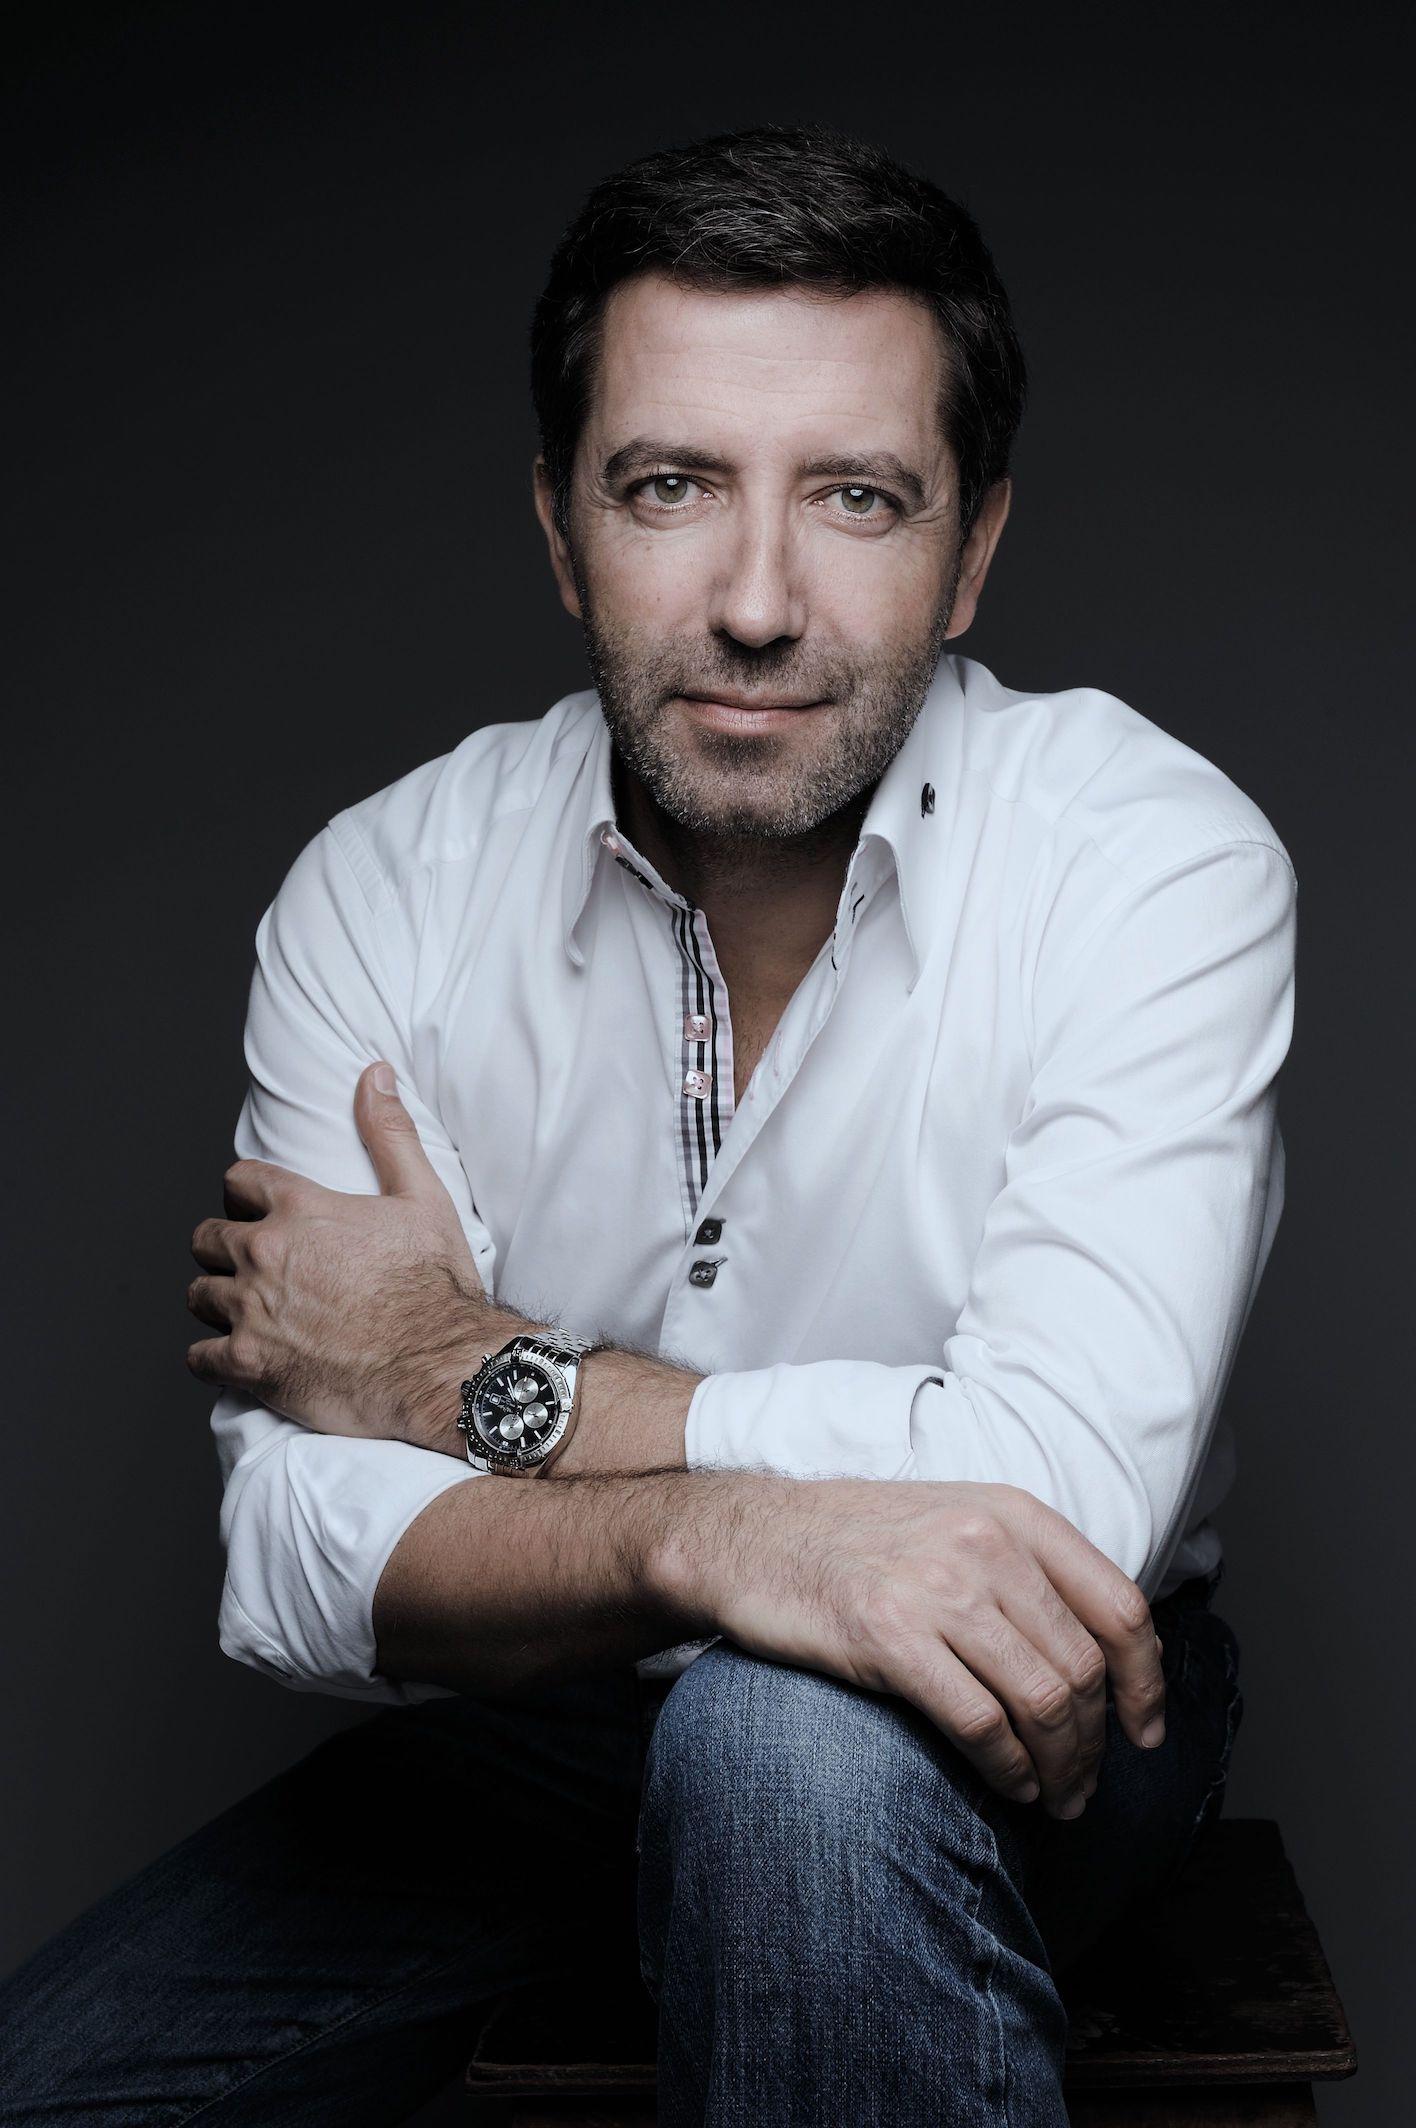 Diamantino Martins